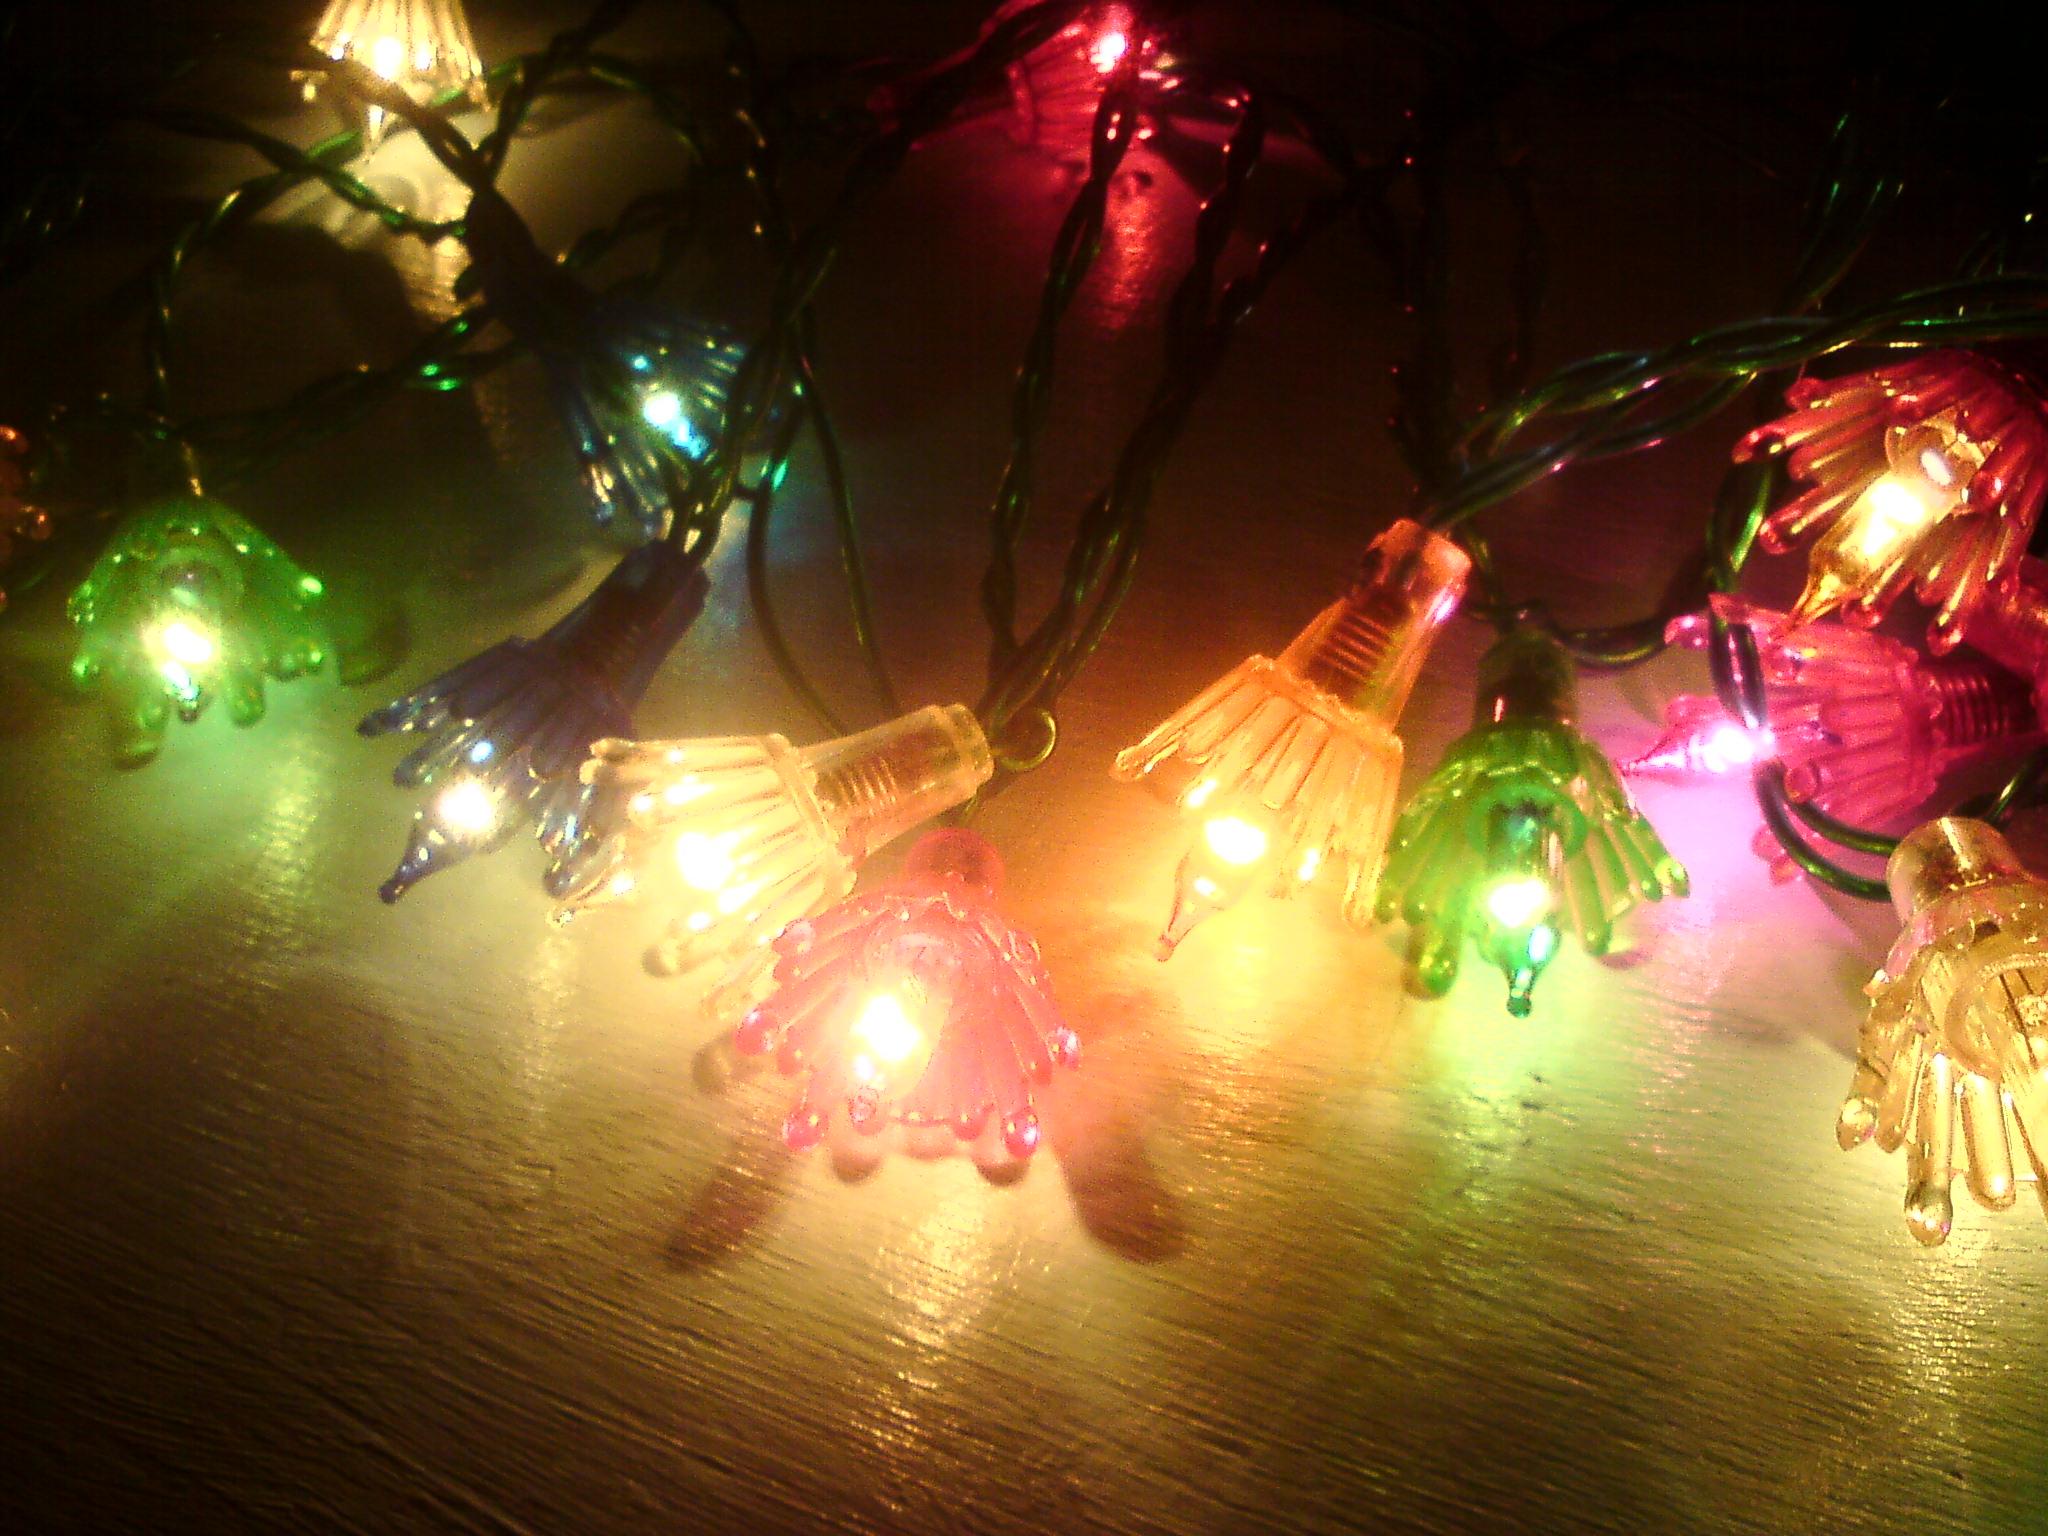 Vintage Fairy Lights Flickr Photo Sharing